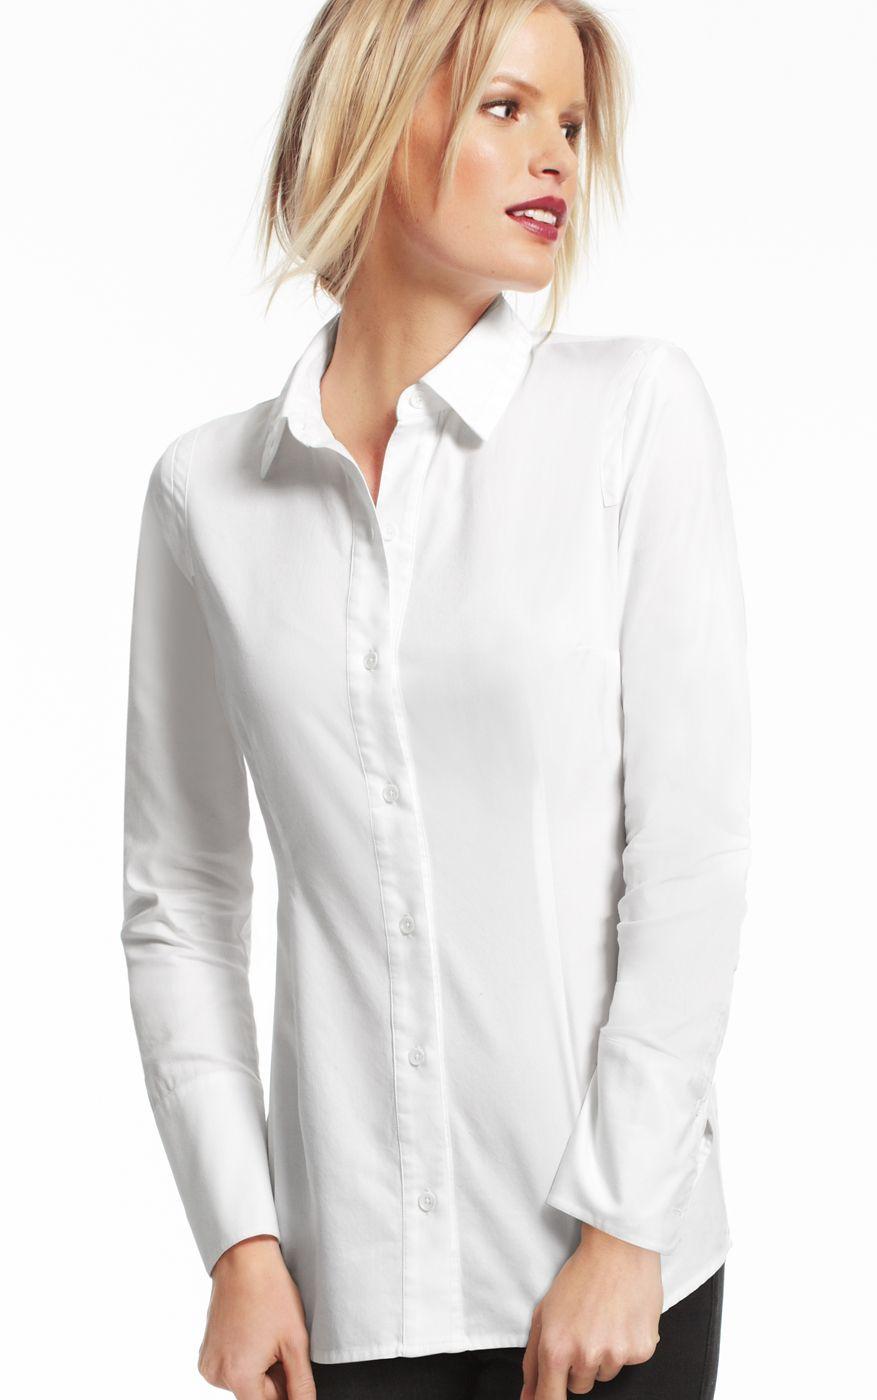 #1 Look: Tailored Shirt - Shirts & Blouses